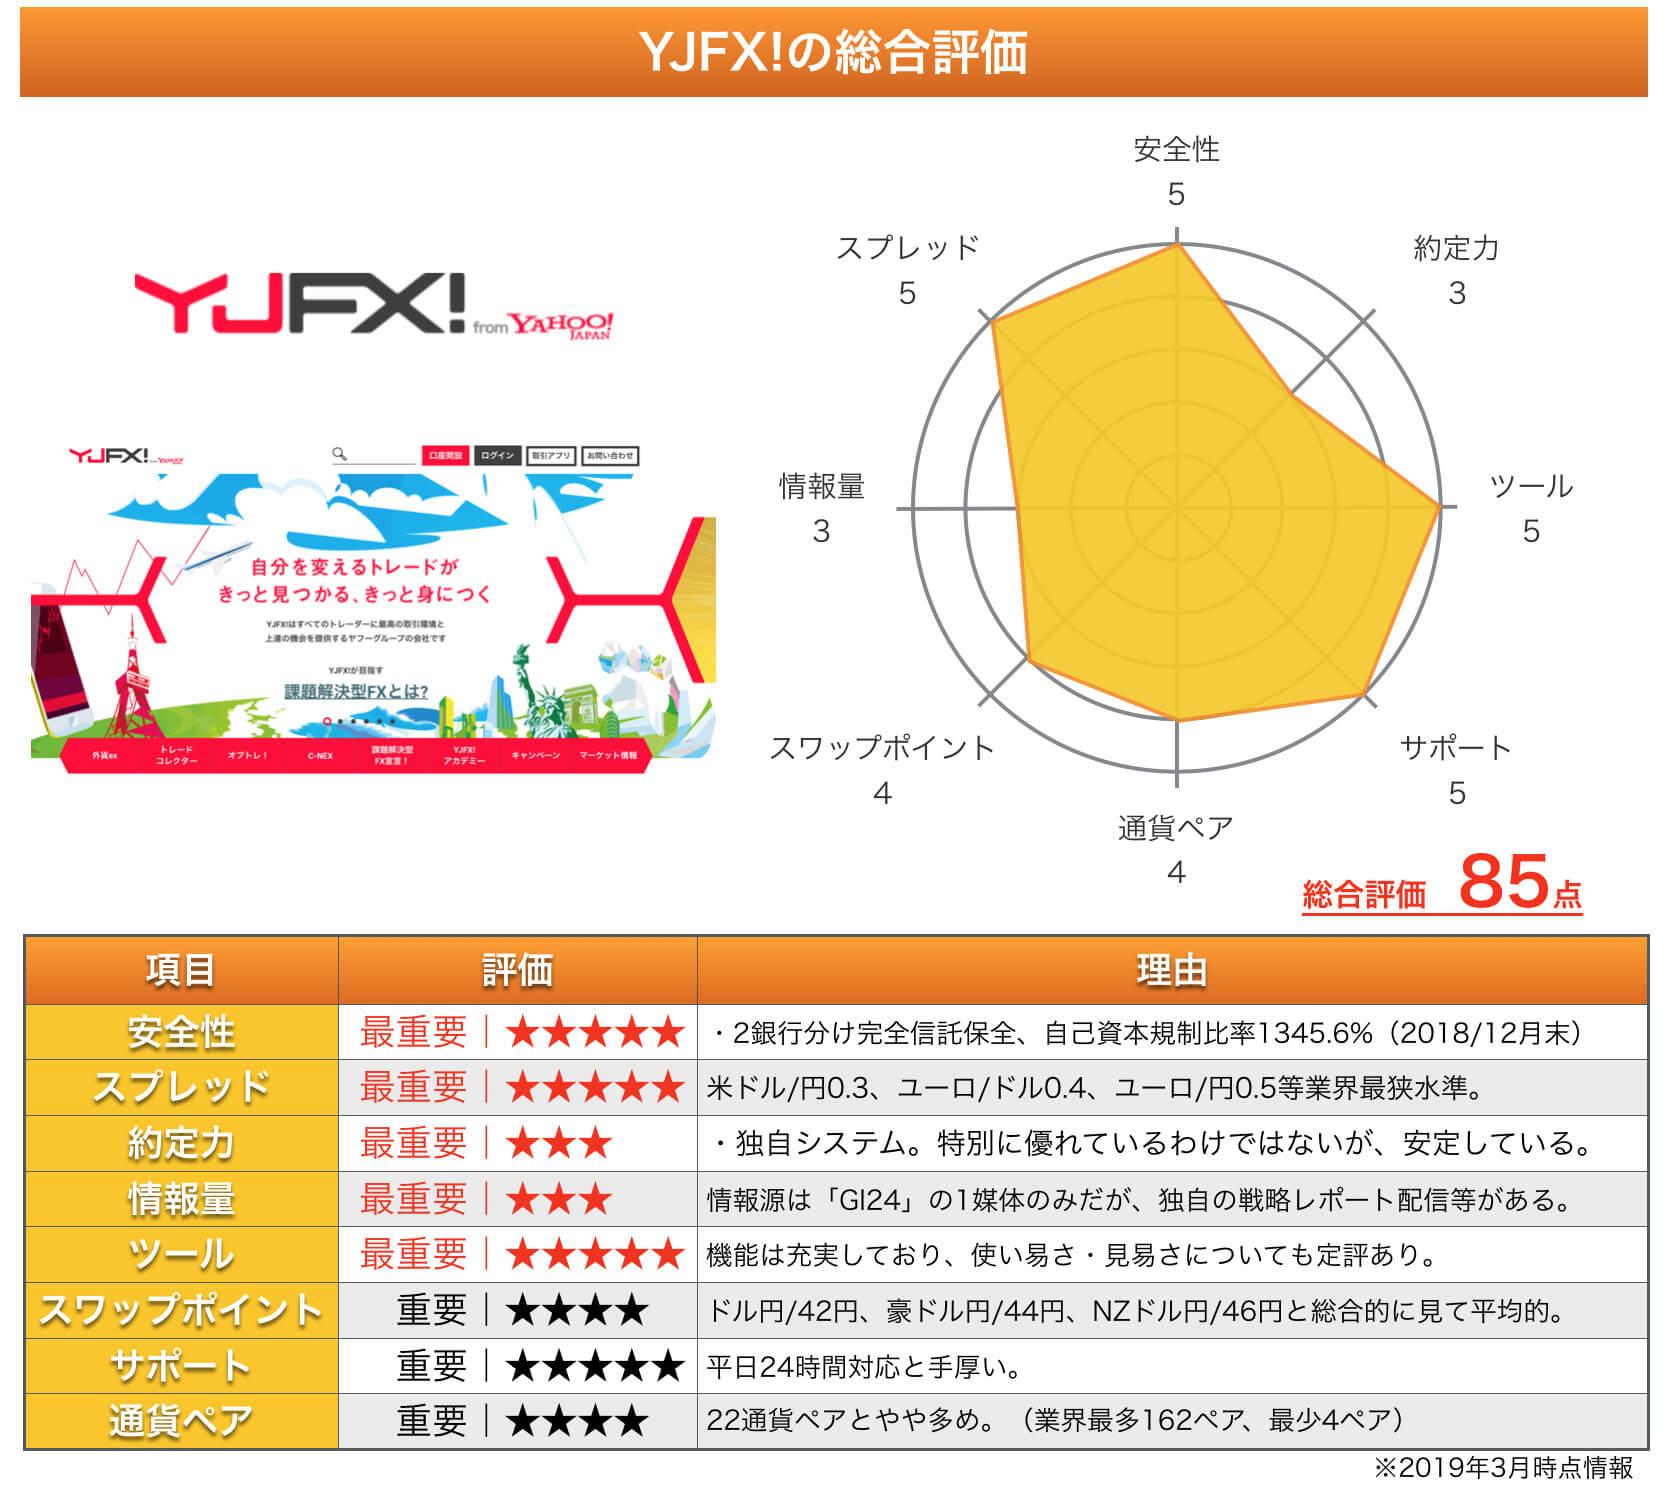 YJFXの総合評価